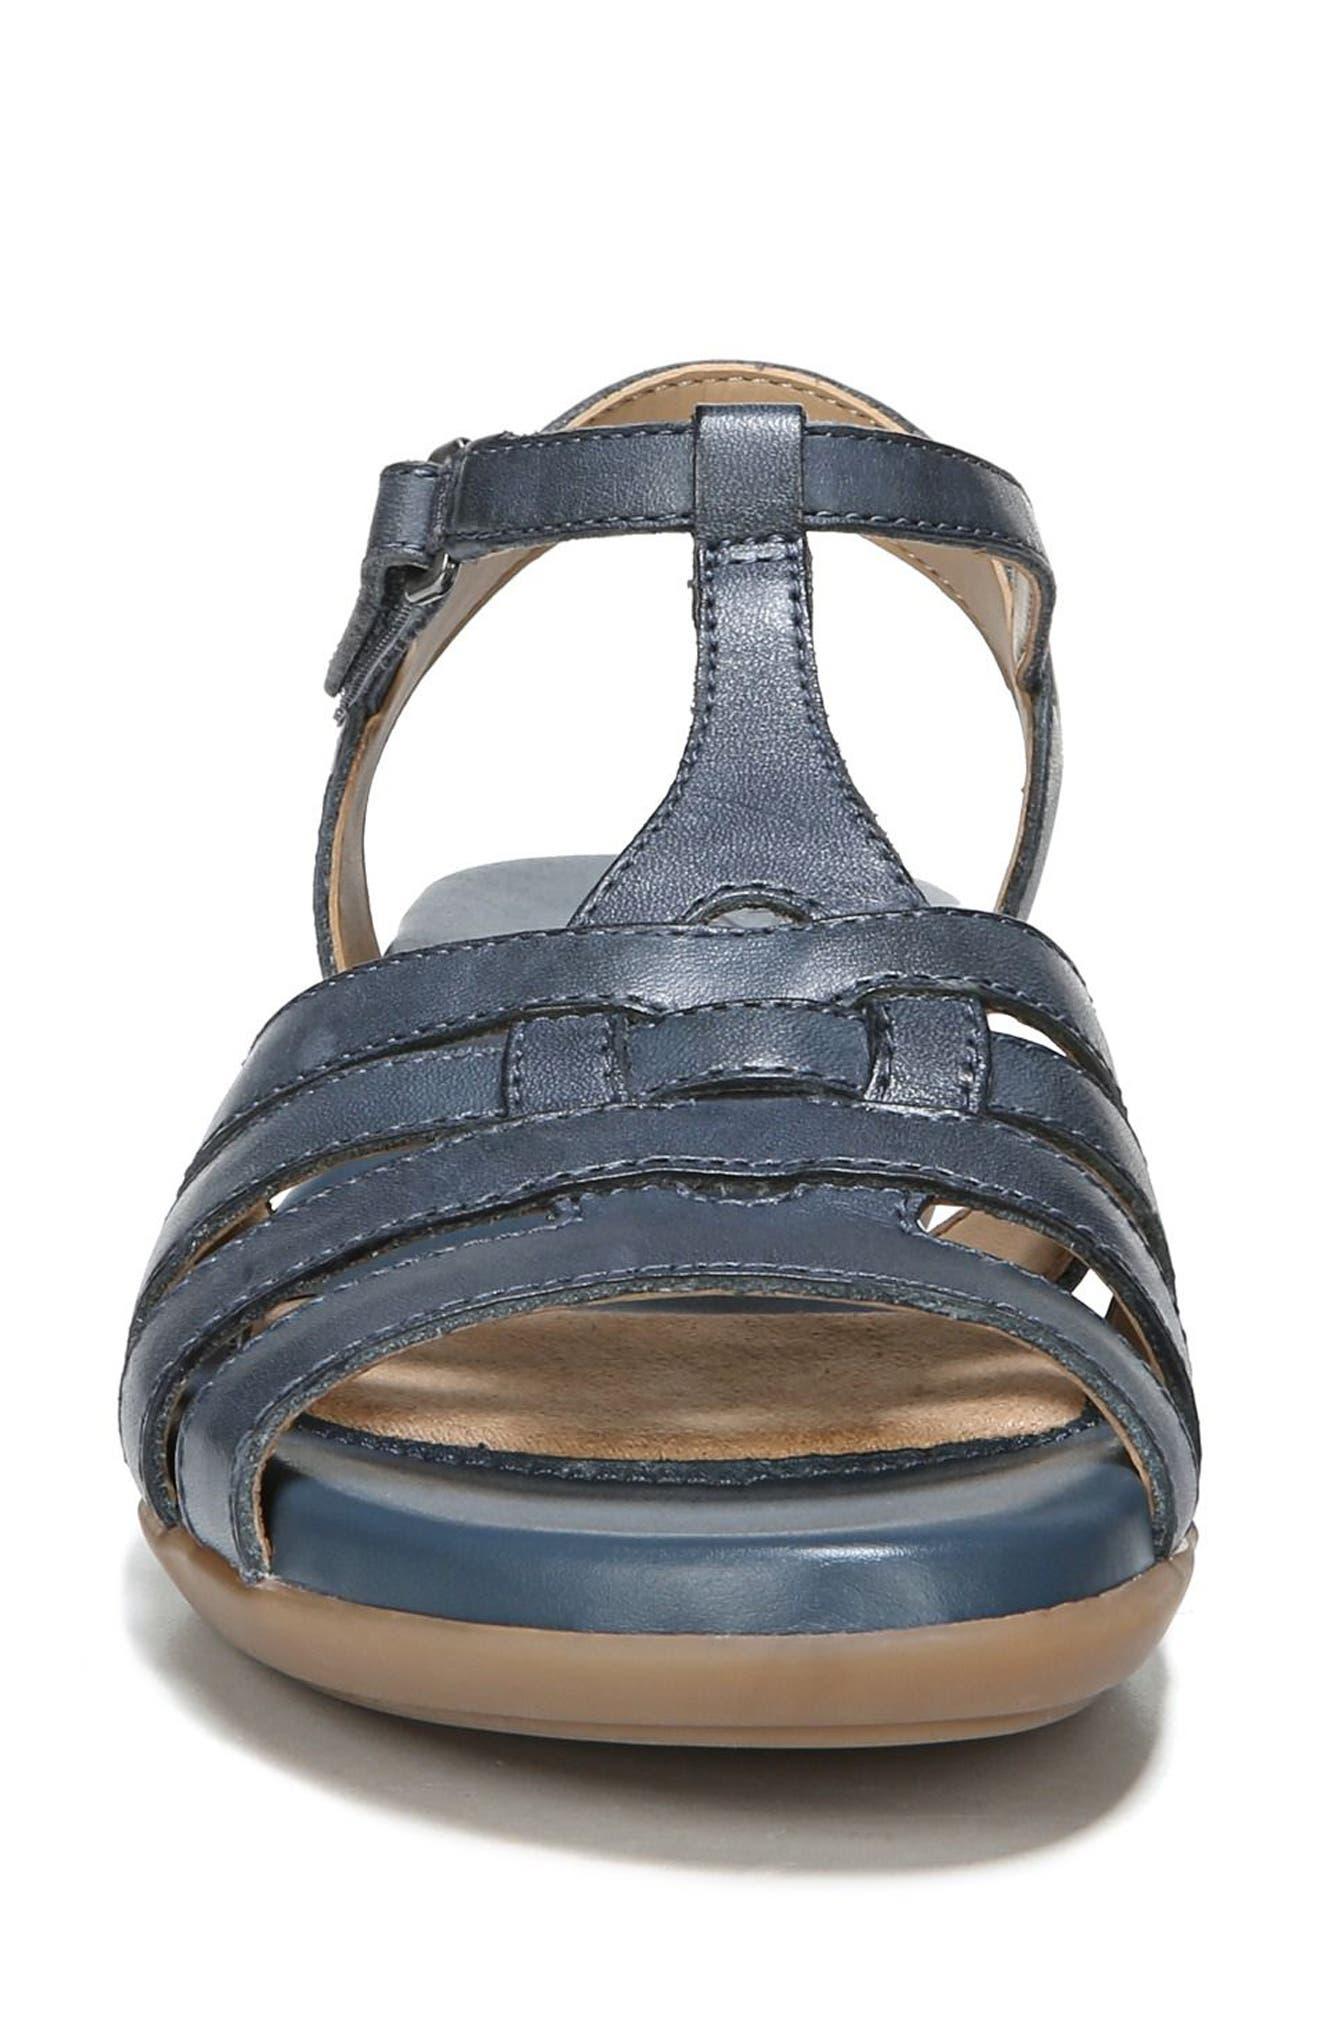 Nanci Sandal,                             Alternate thumbnail 4, color,                             Denim Leather